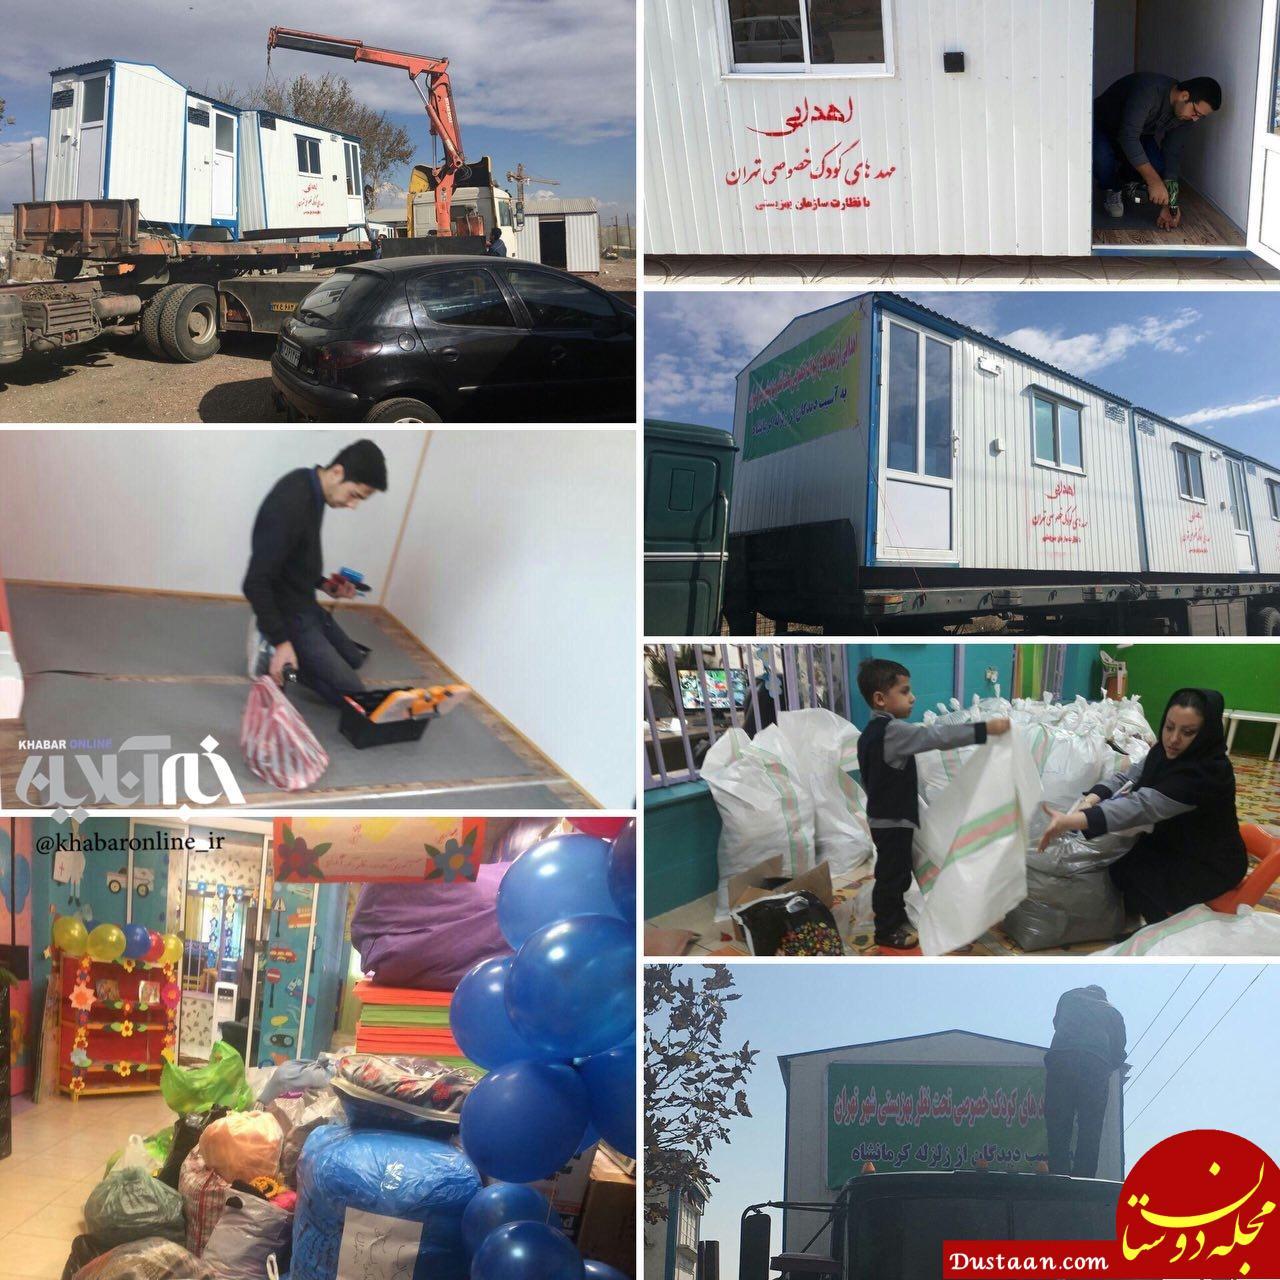 www.dustaan.com اهدای ۴ مهدکودک سیار به مناطق زلزله زده کرمانشاه +عکس